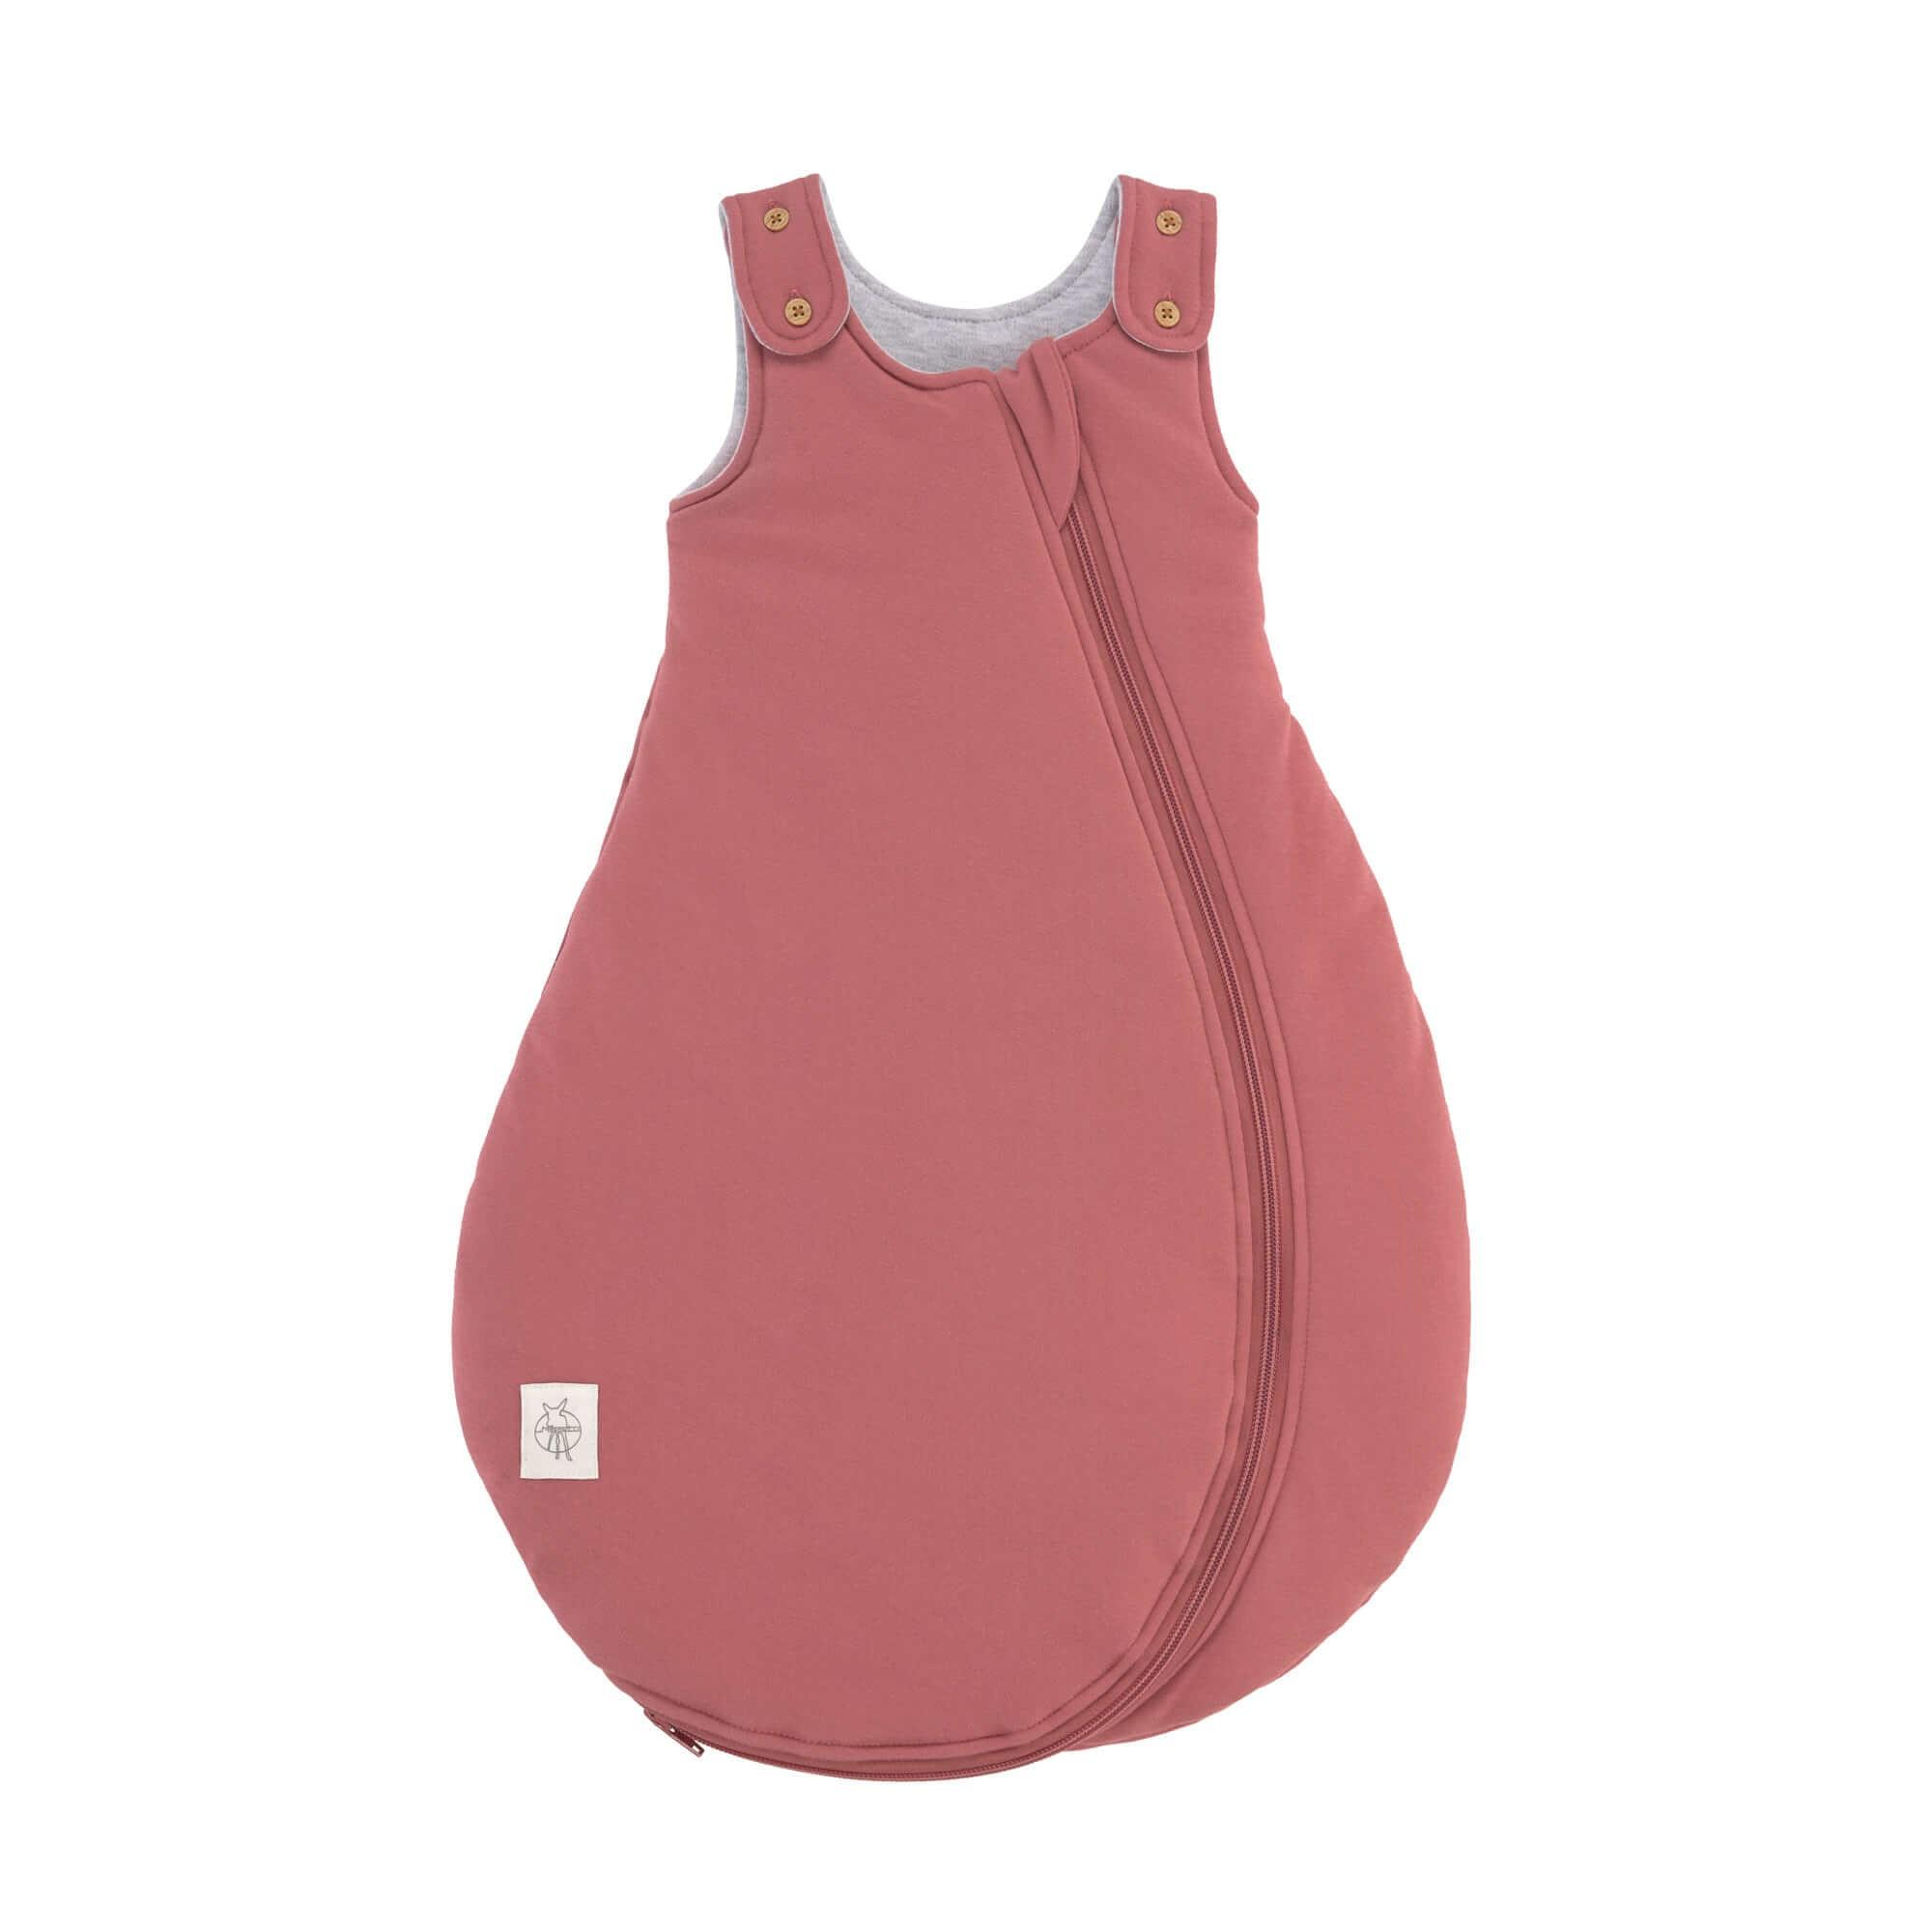 Lassig - Baby Sleeping Bag rosewood, 50/56 0-2M, all season edition